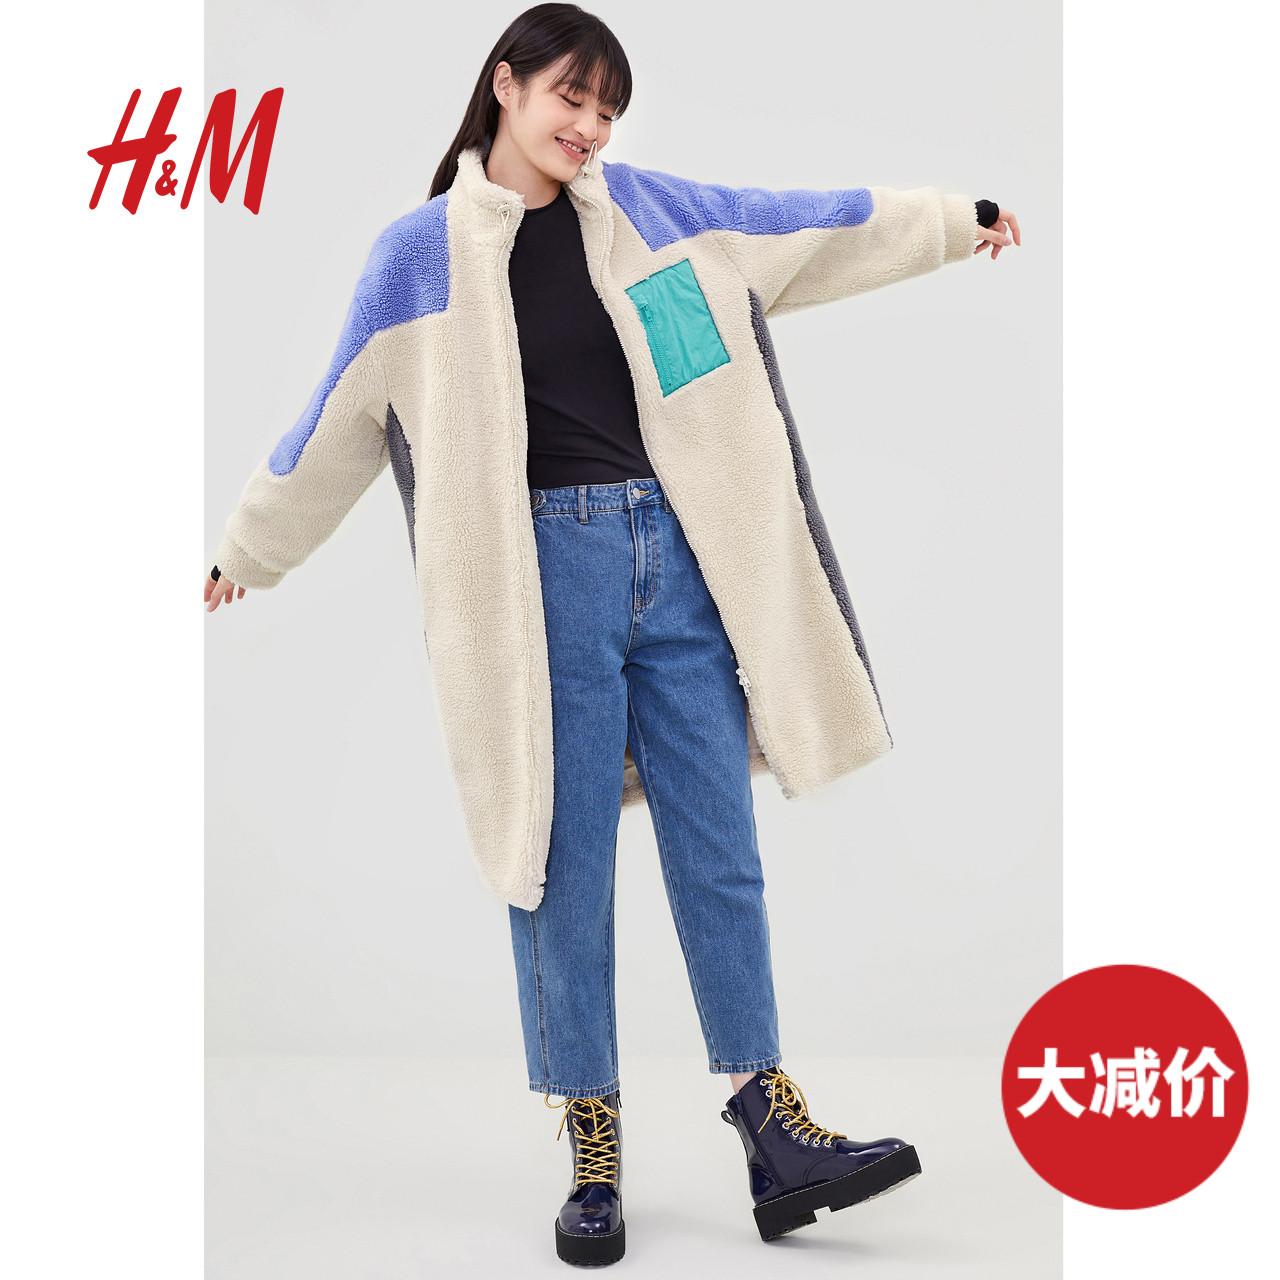 H&M 0915264 女装摇粒绒长款外套